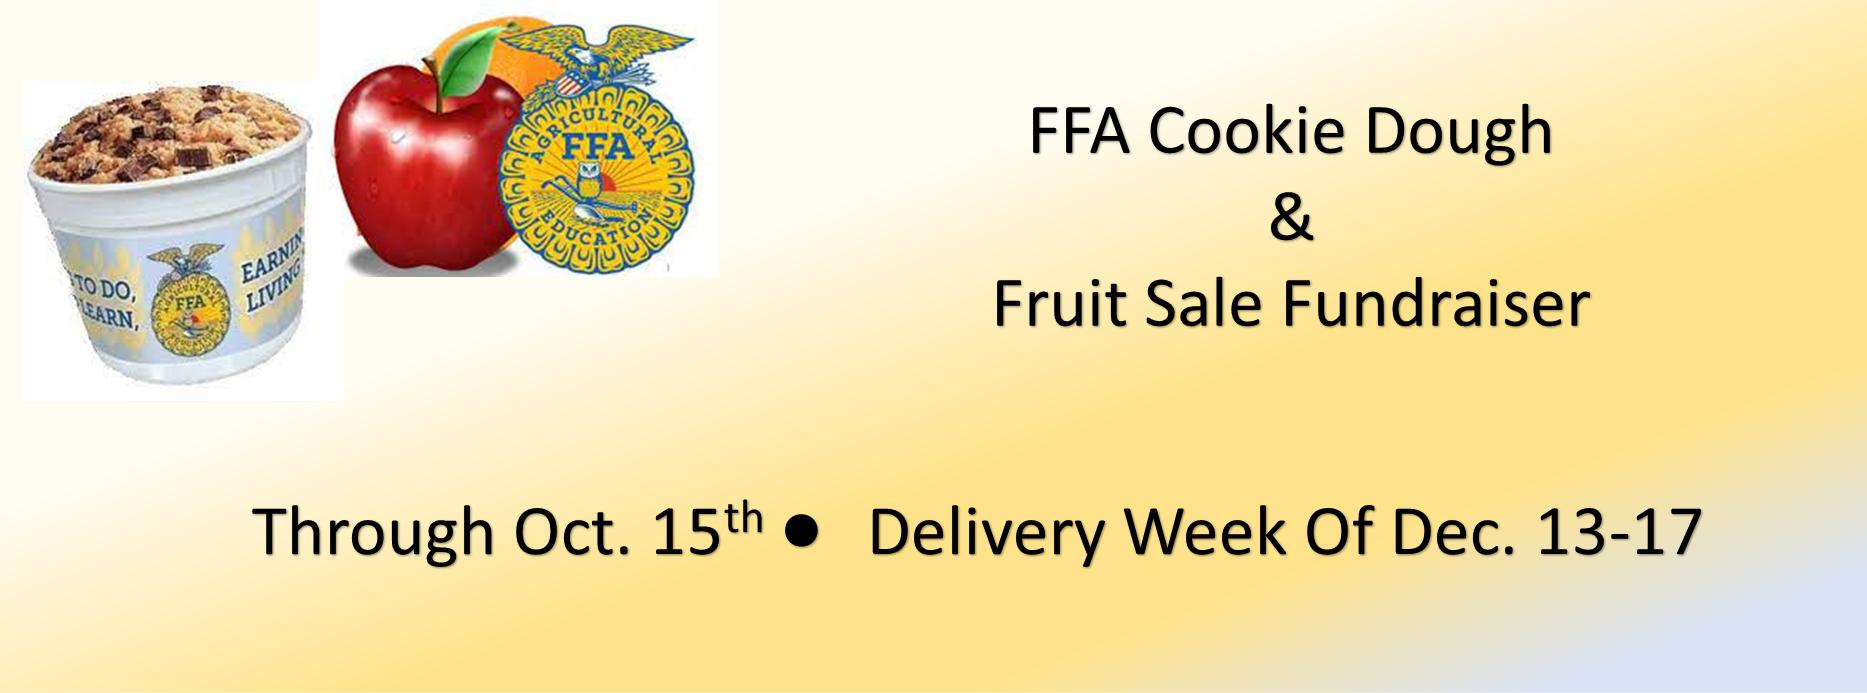 cookiedough&fruitsale